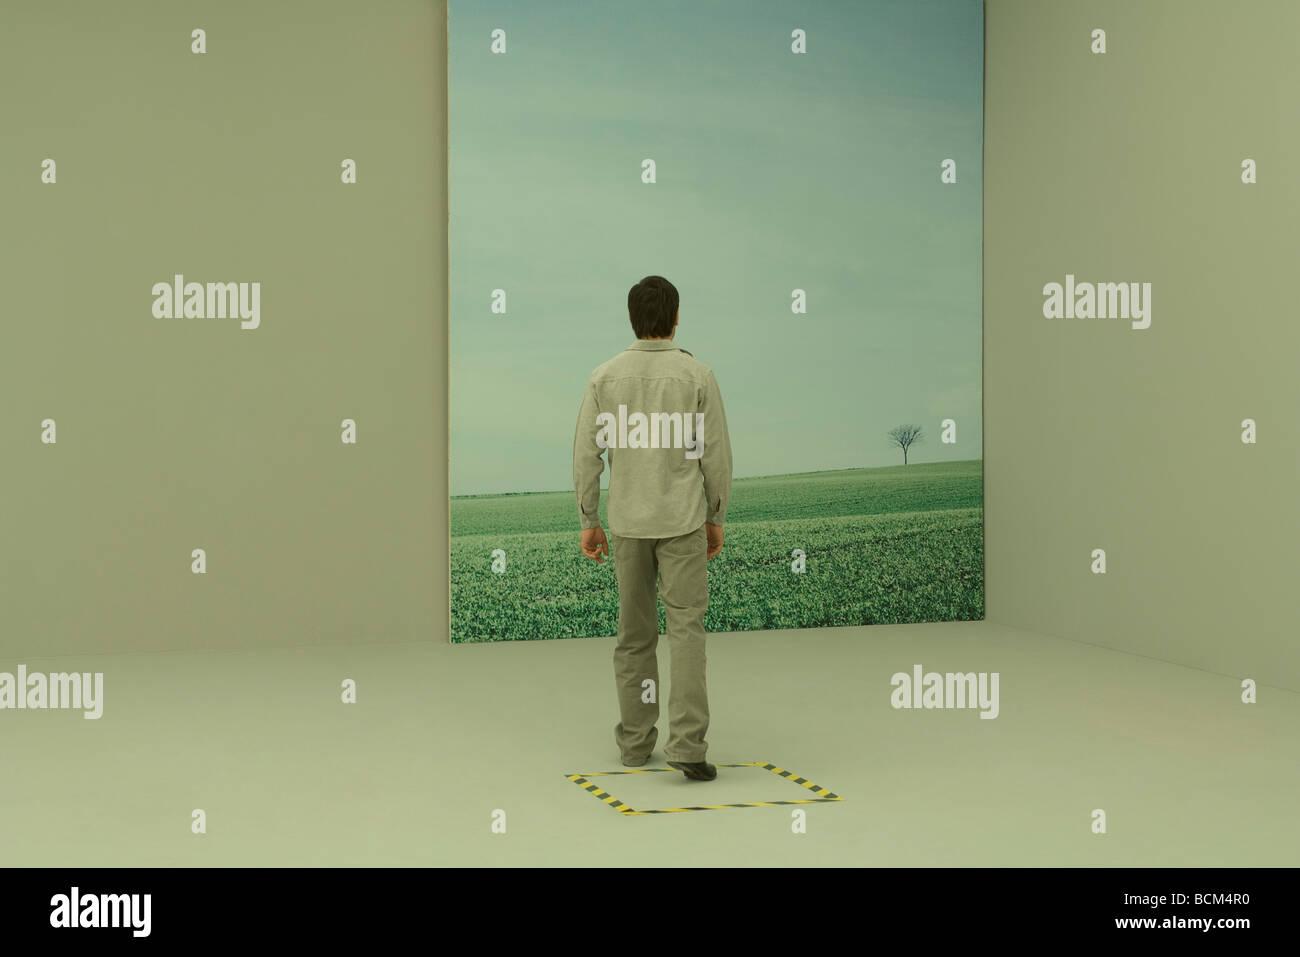 Man stepping toward large photograph of rural scene, hazard tape on the floor around him - Stock Image